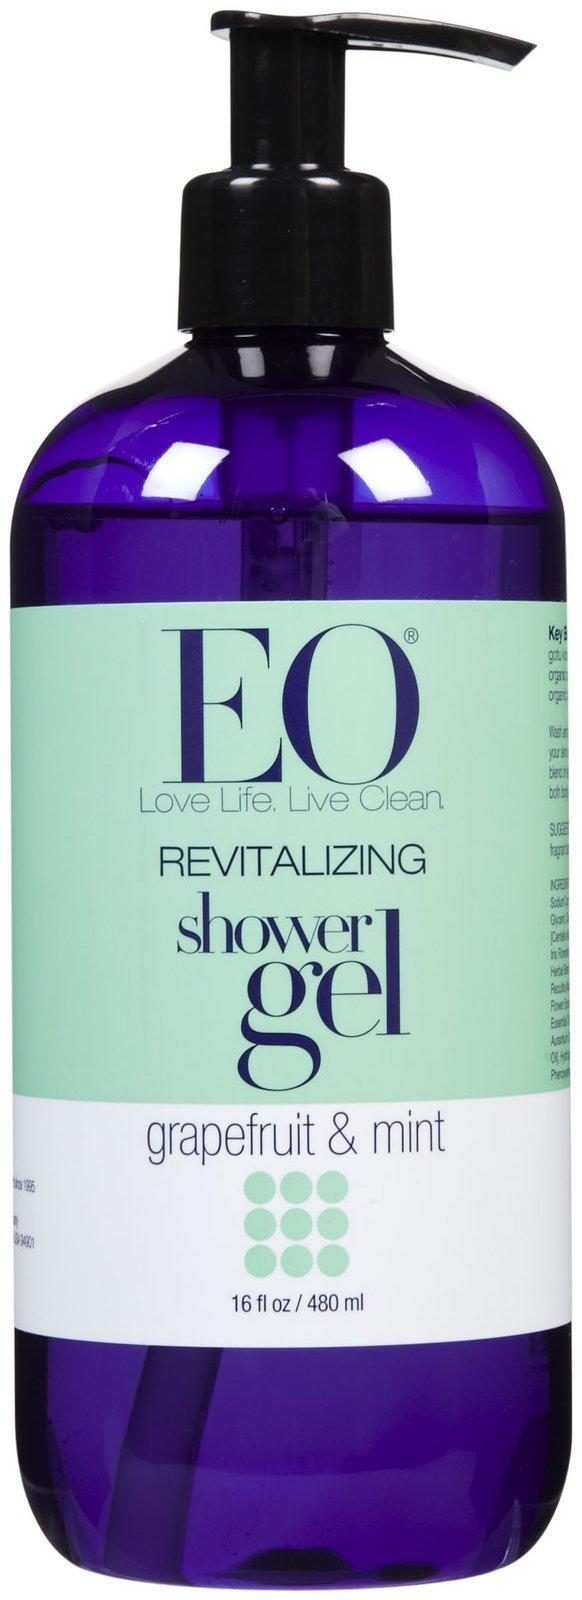 EO Products Shower Gel - Grapefruit & Mint - 16 oz